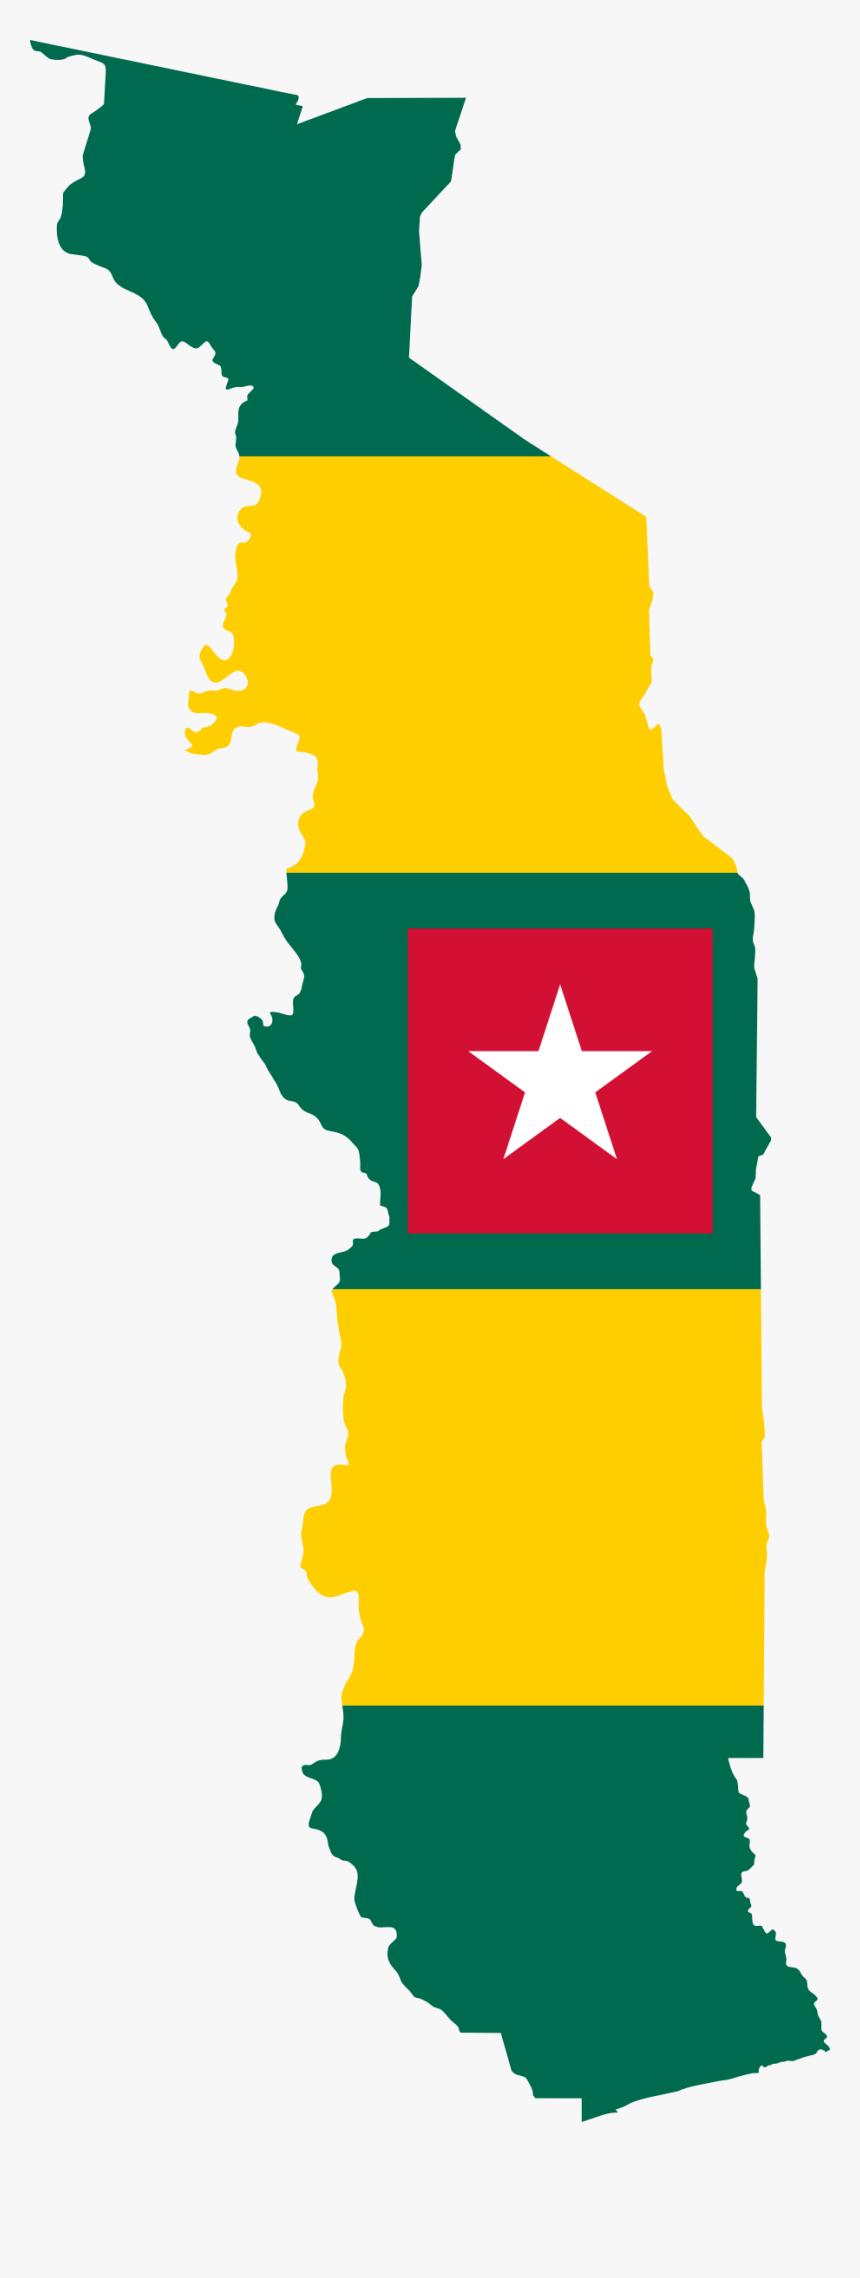 Togo Flag Map Clip Arts - Flag Map Of Togo, HD Png Download, Free Download